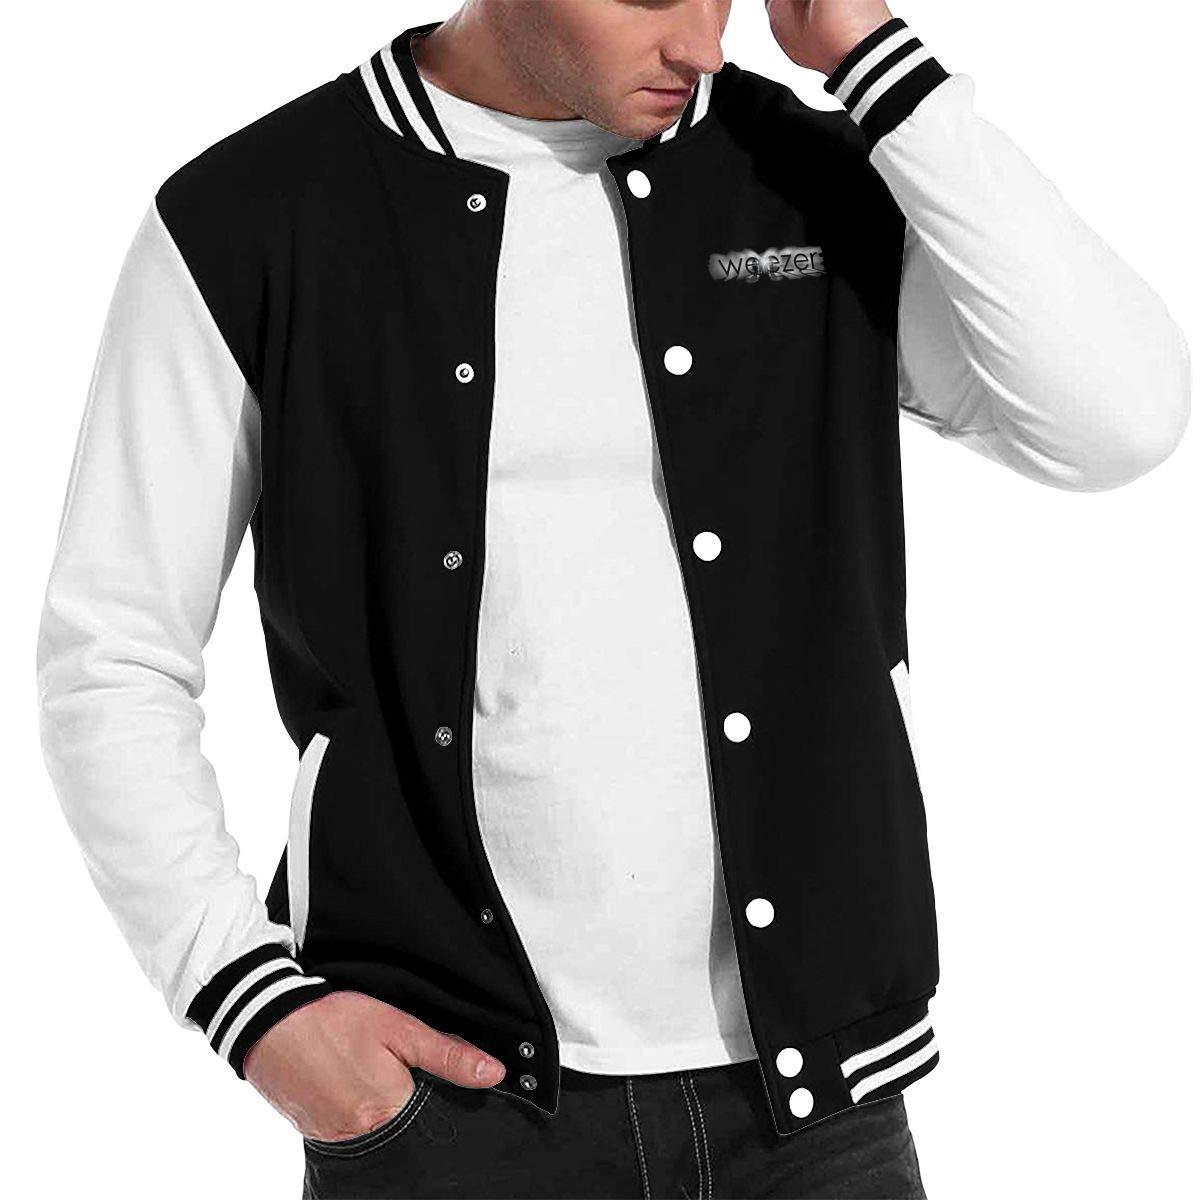 Weezer Christmas Sweater.Amazon Com Weezer Rock Music Unisex Baseball Uniform Jacket